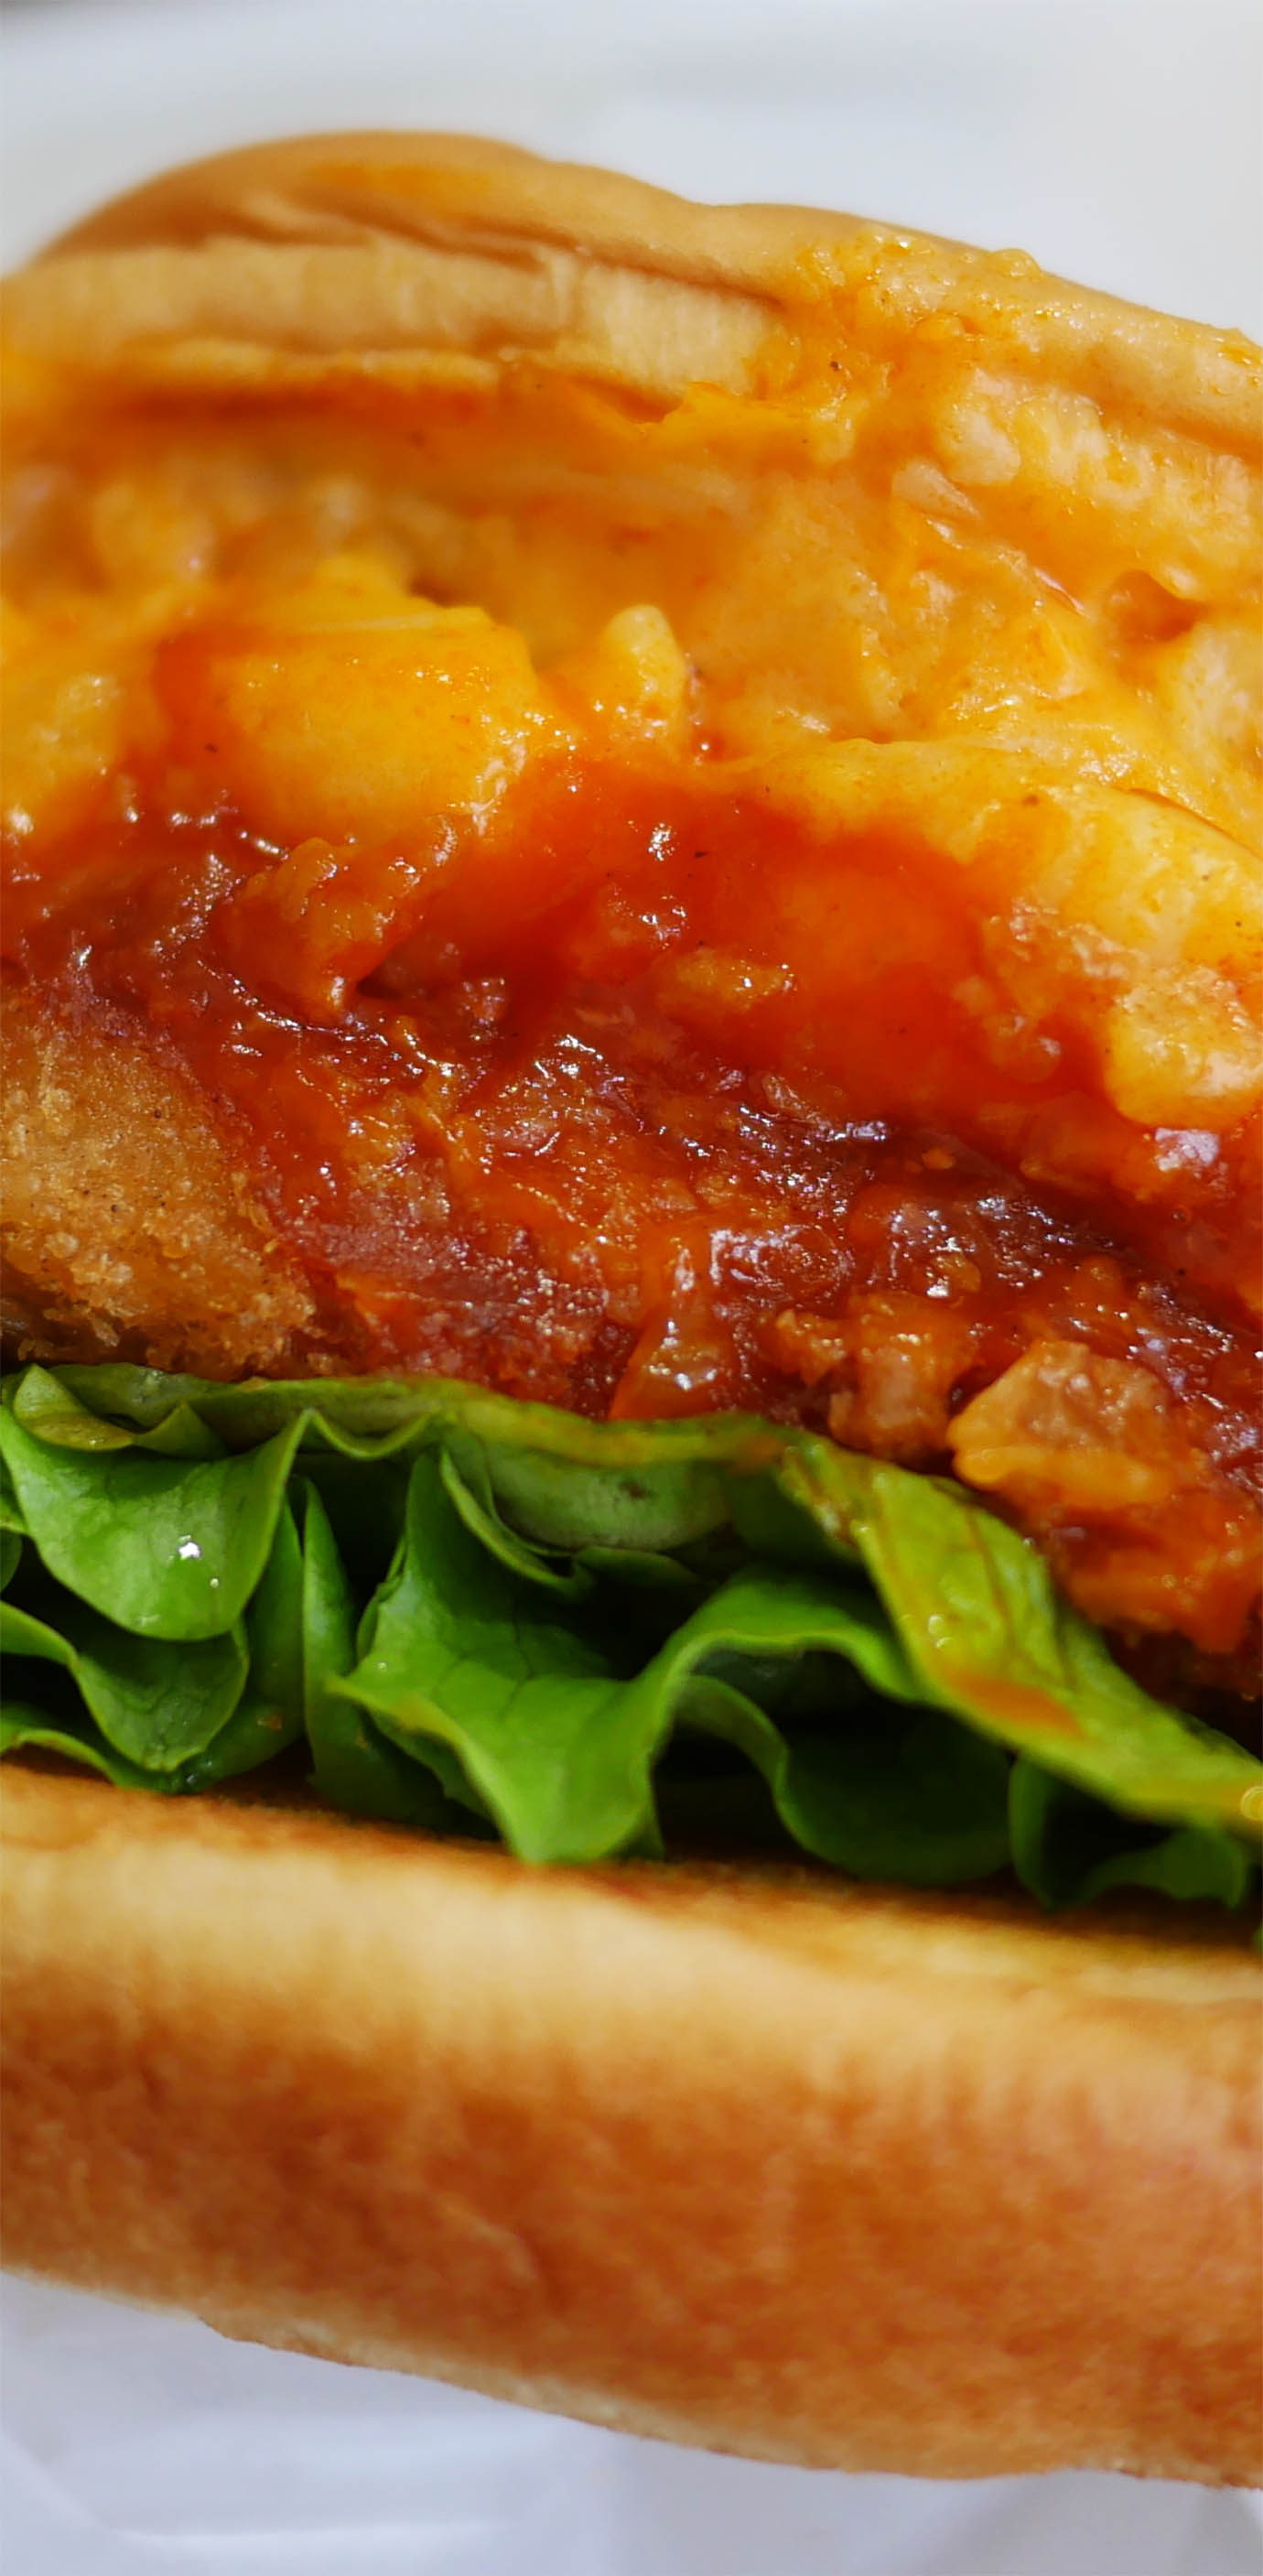 mos-mackencheese-croquette-burger2